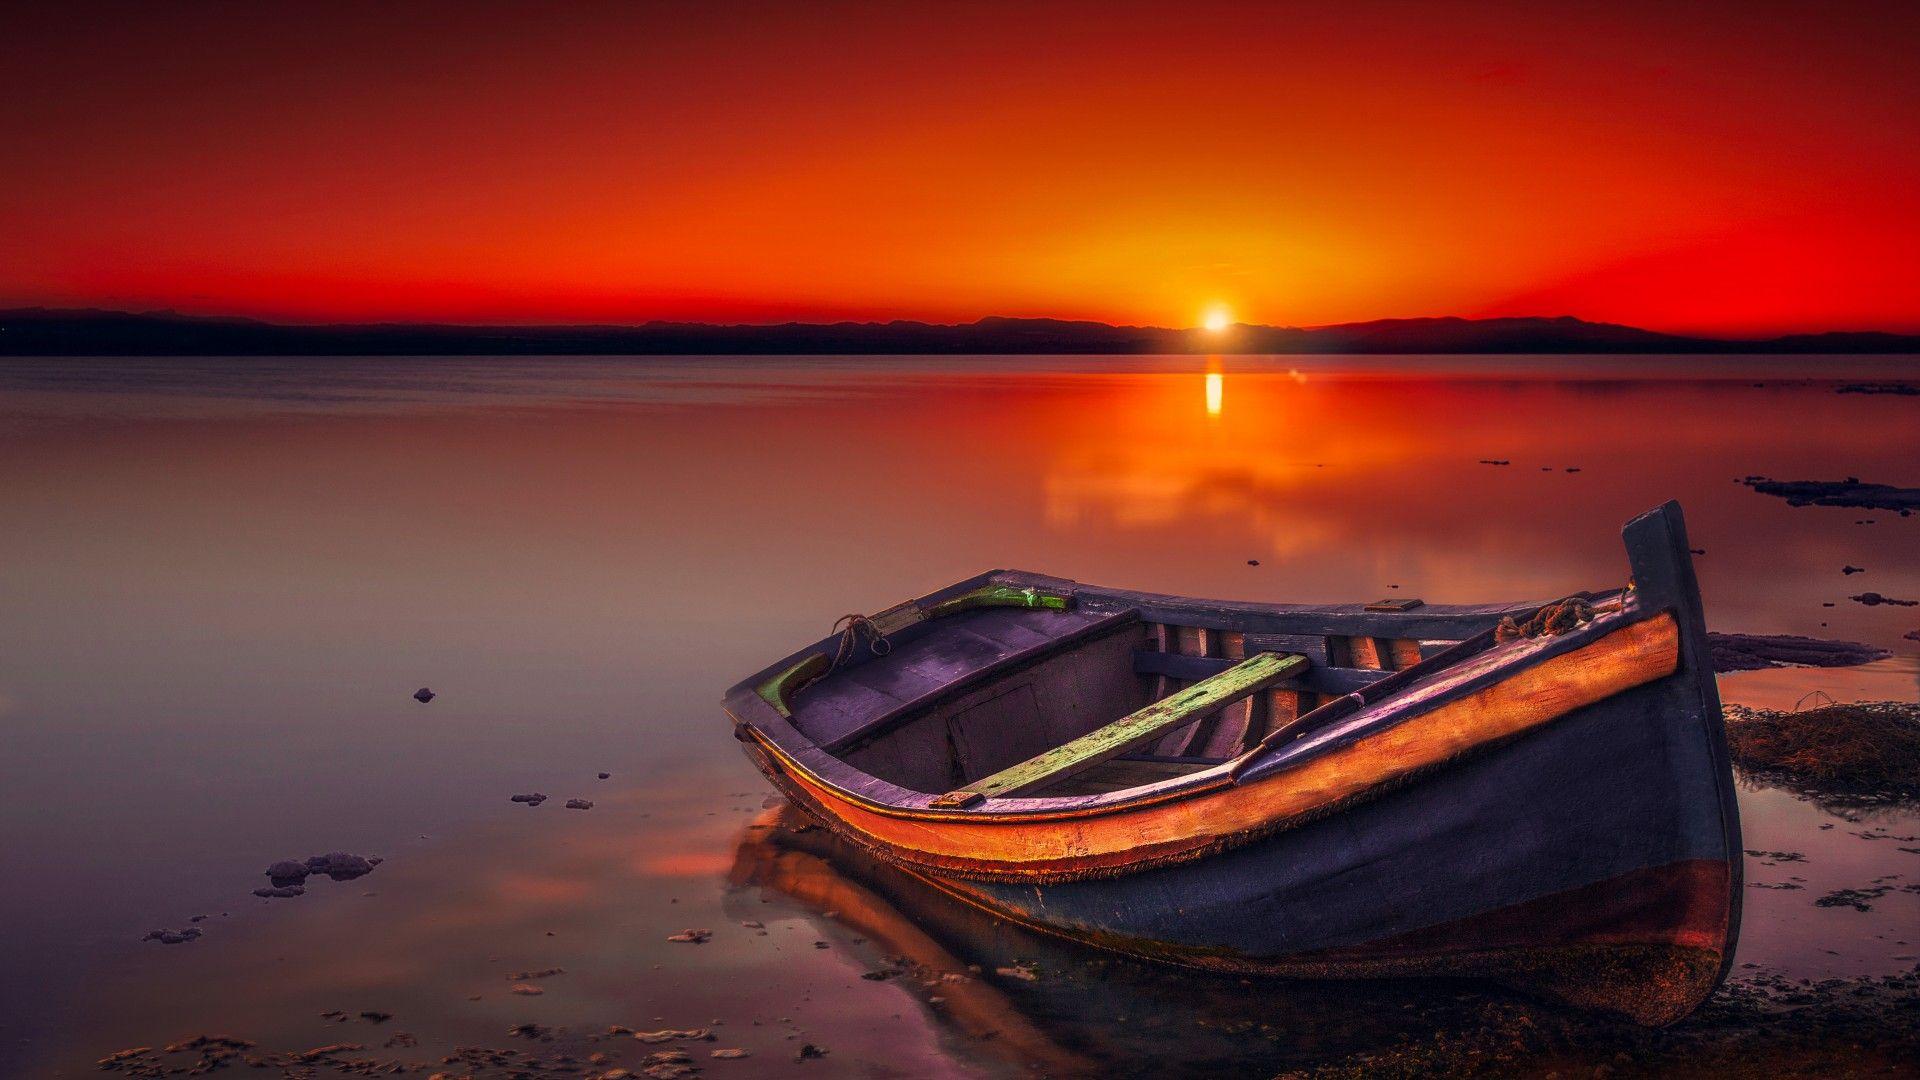 Beach Boat Sunset Wallpaper Sunset Wallpaper Red Sunset Sunset